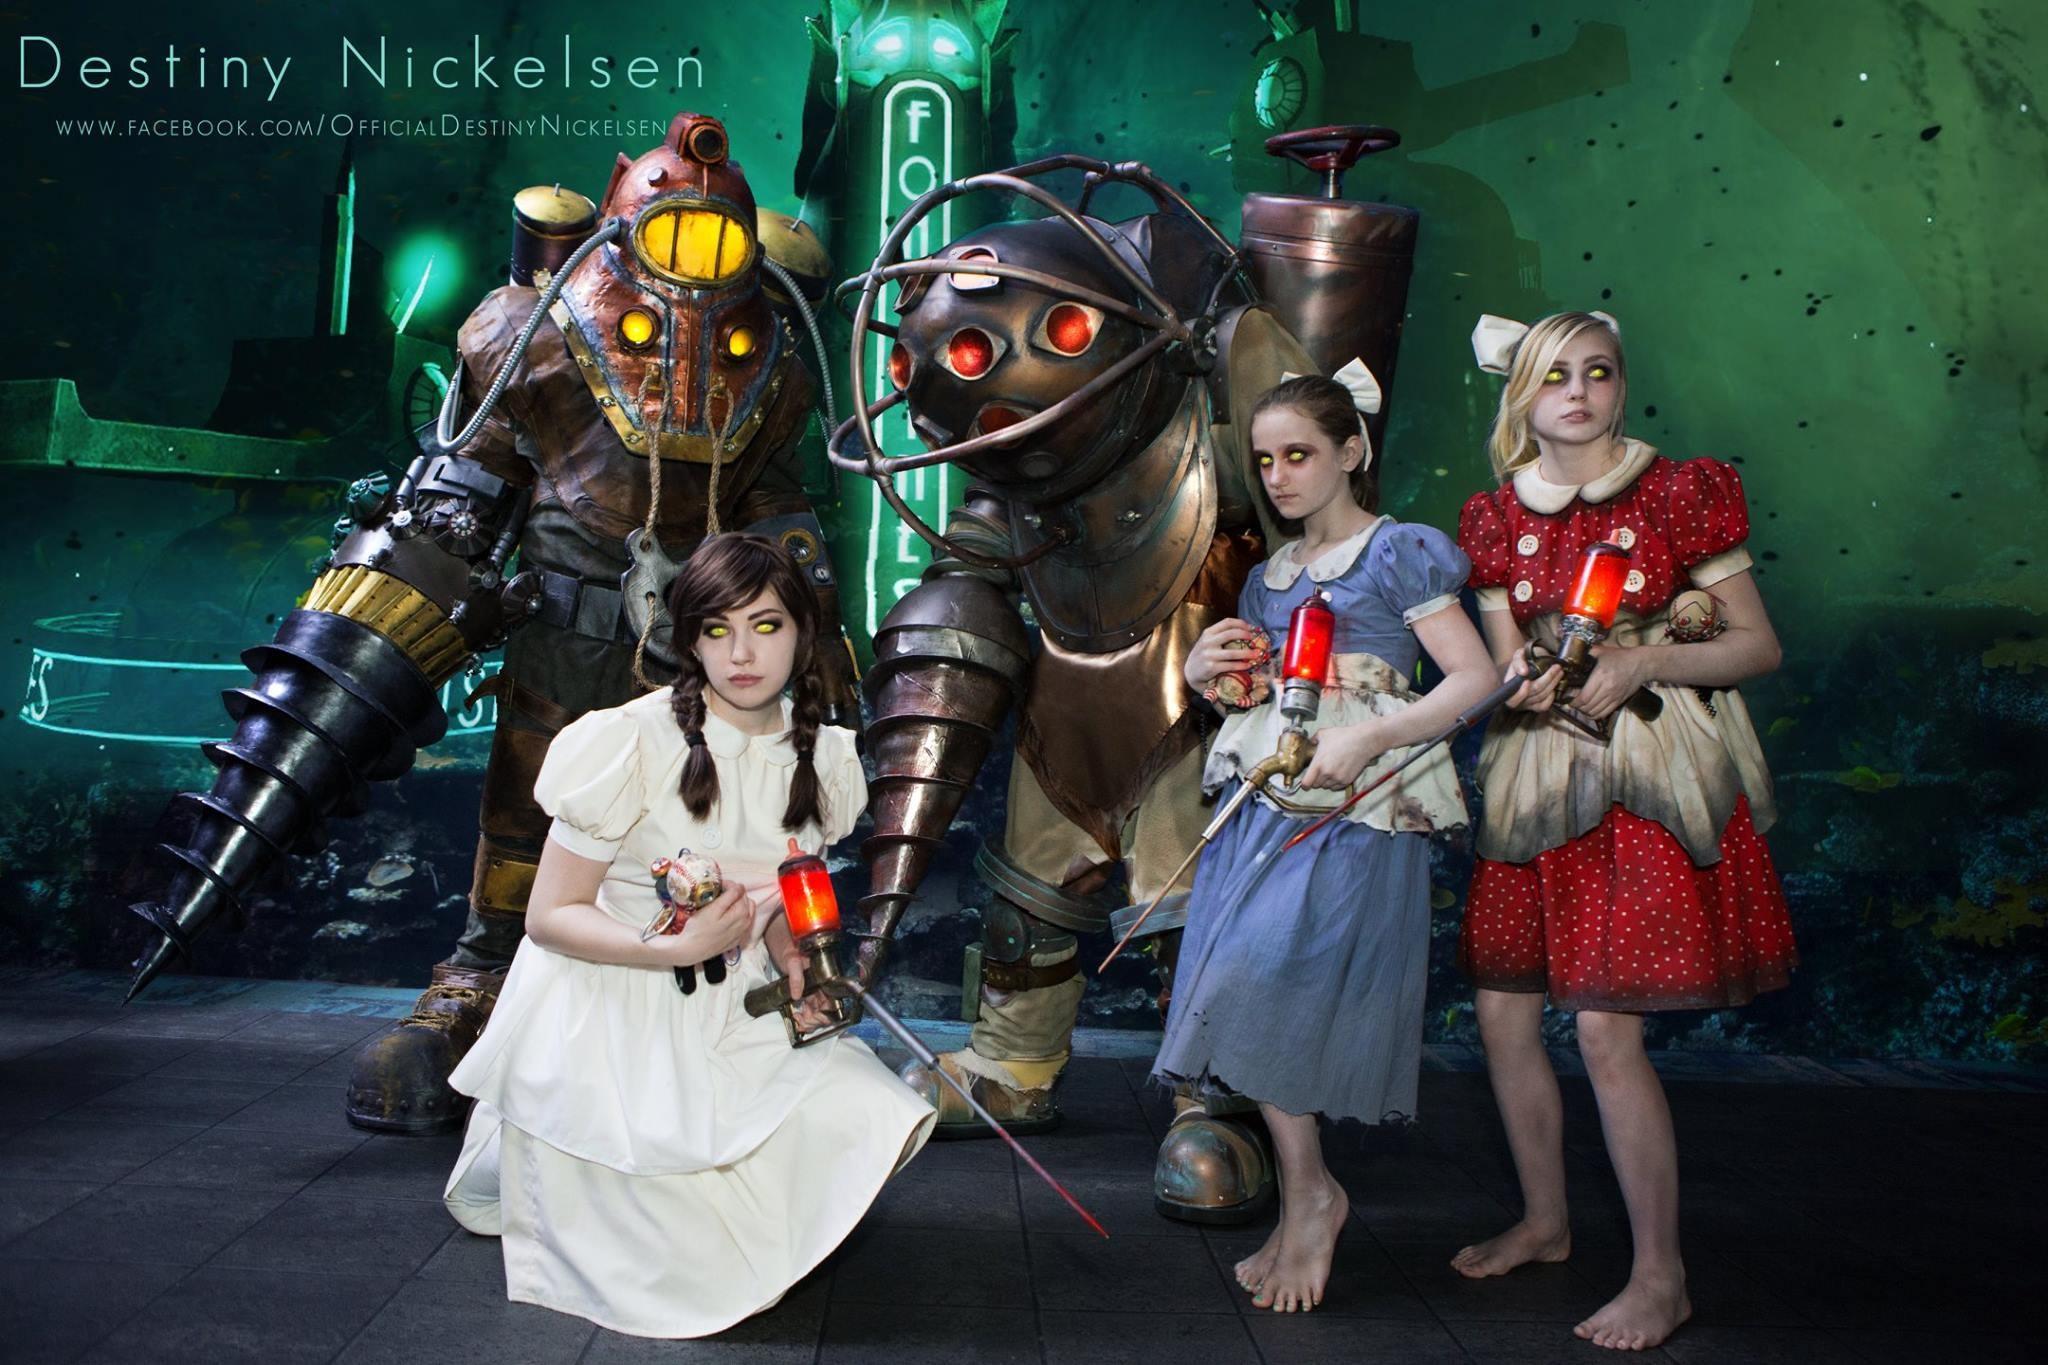 bioshock little sister watermarked cosplay video games big daddy